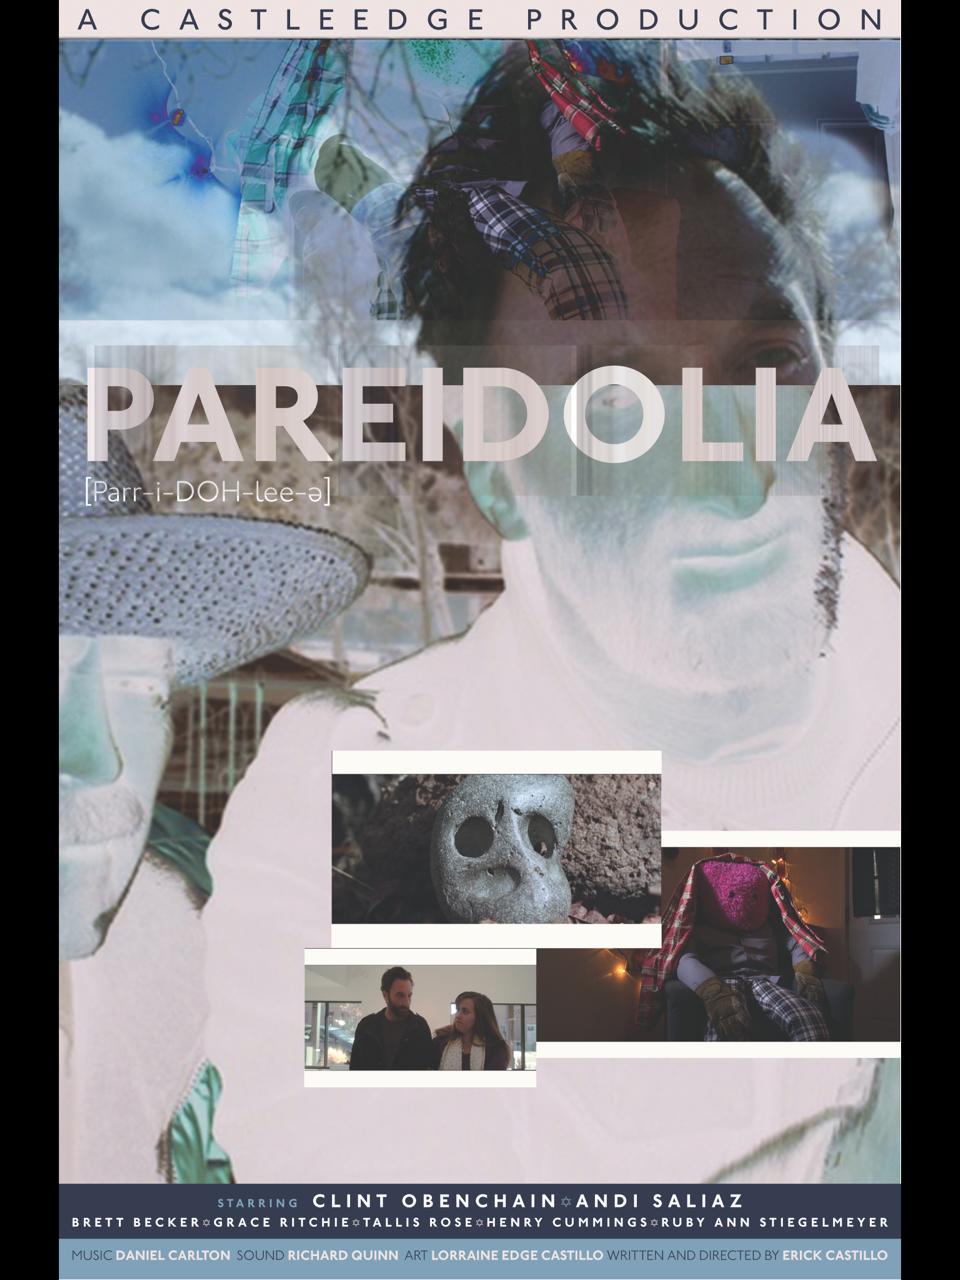 Pareidolia.png